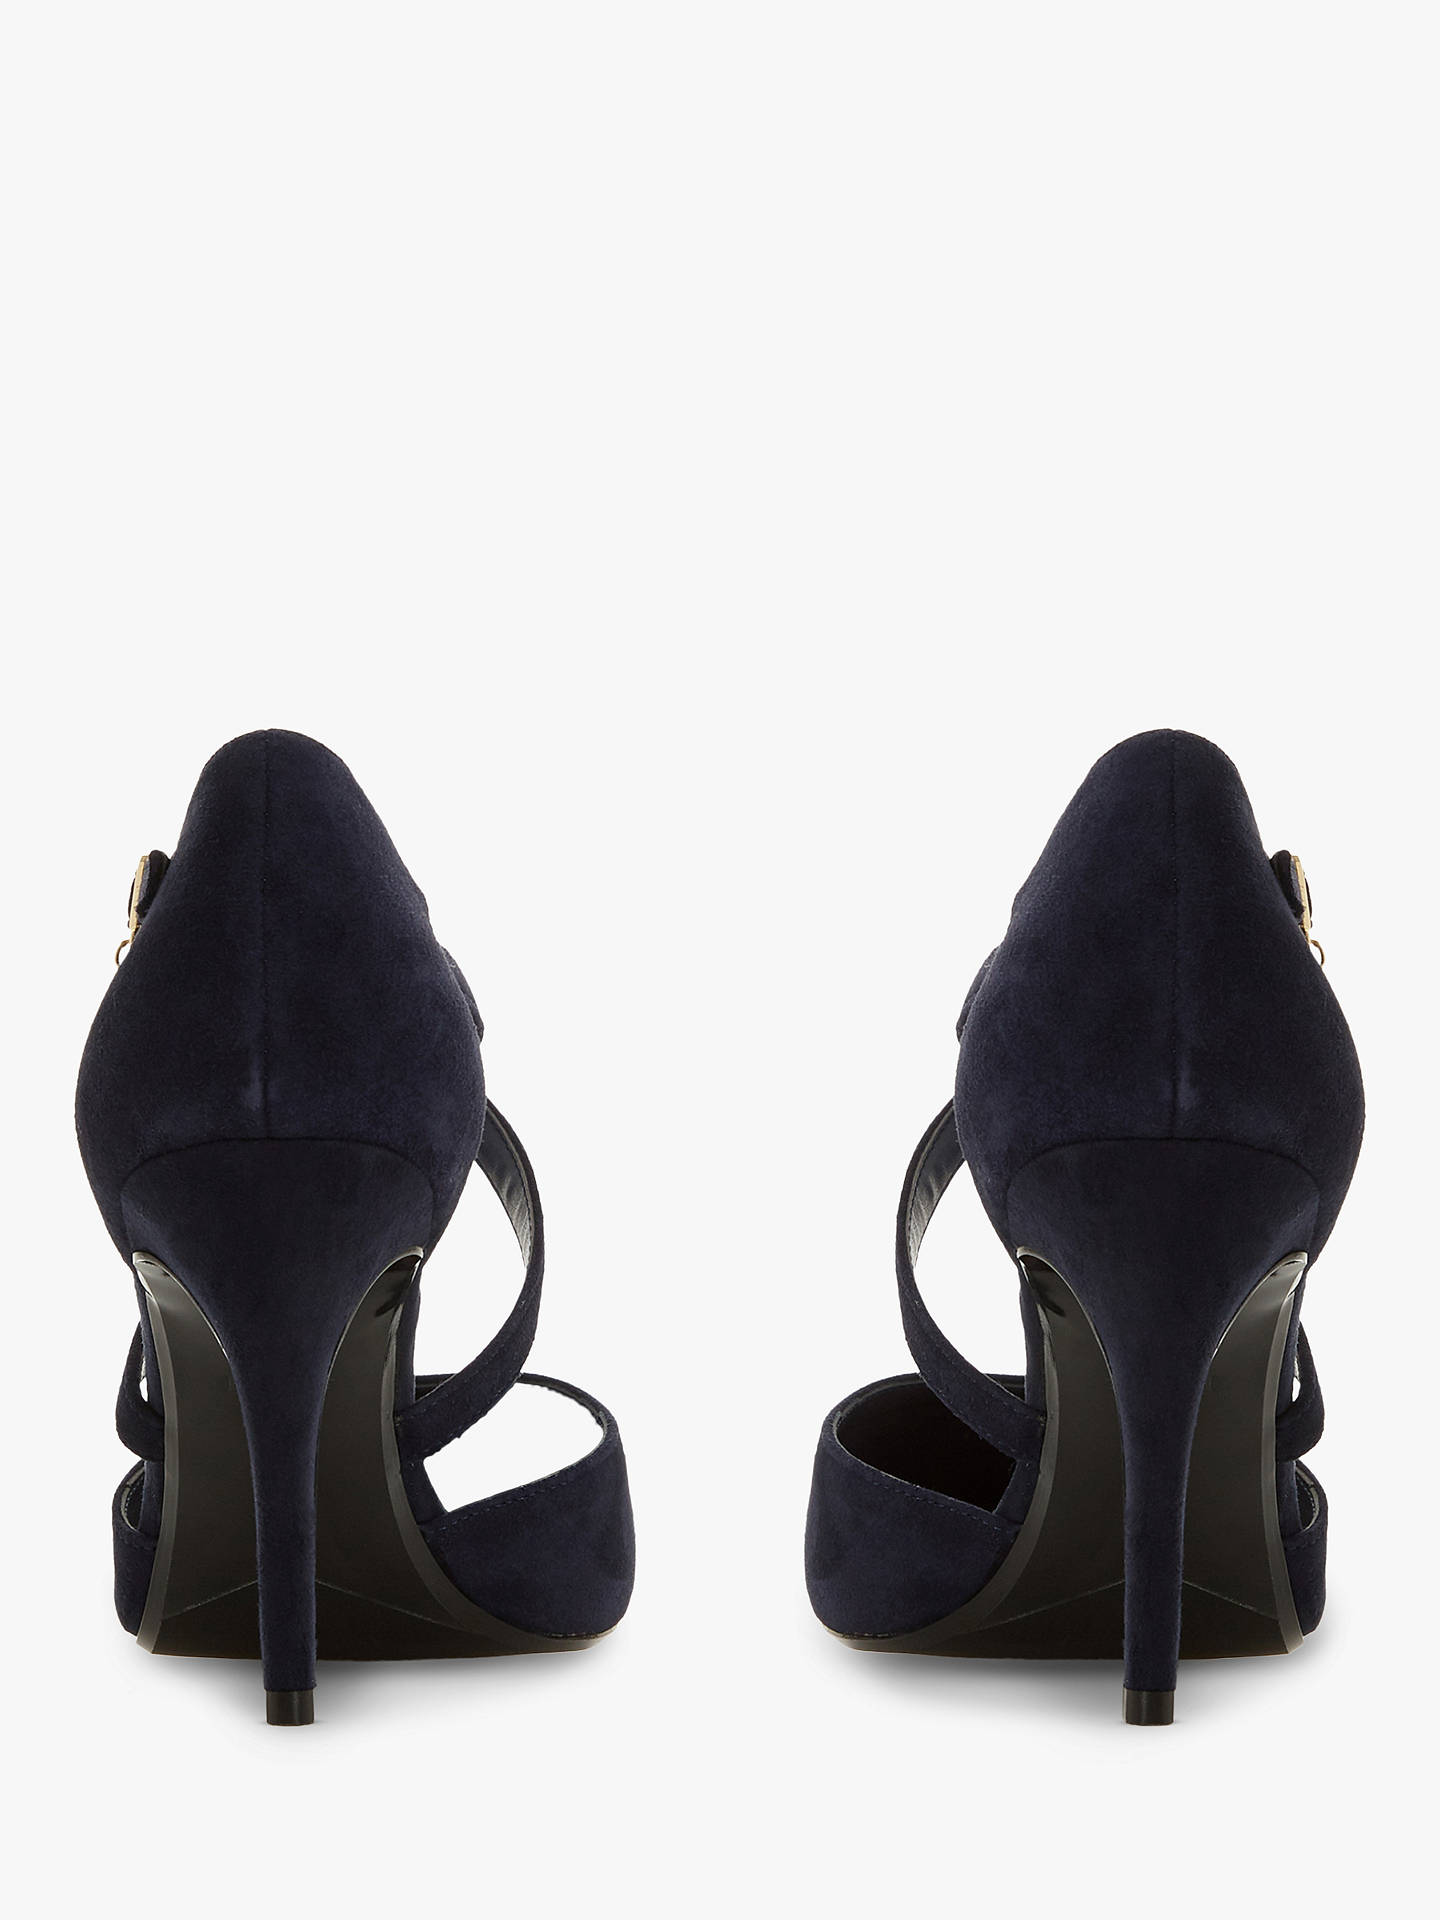 b9ac3b8c0978 Dune Clancy Wide Fit Cross Strap Court Shoes at John Lewis   Partners